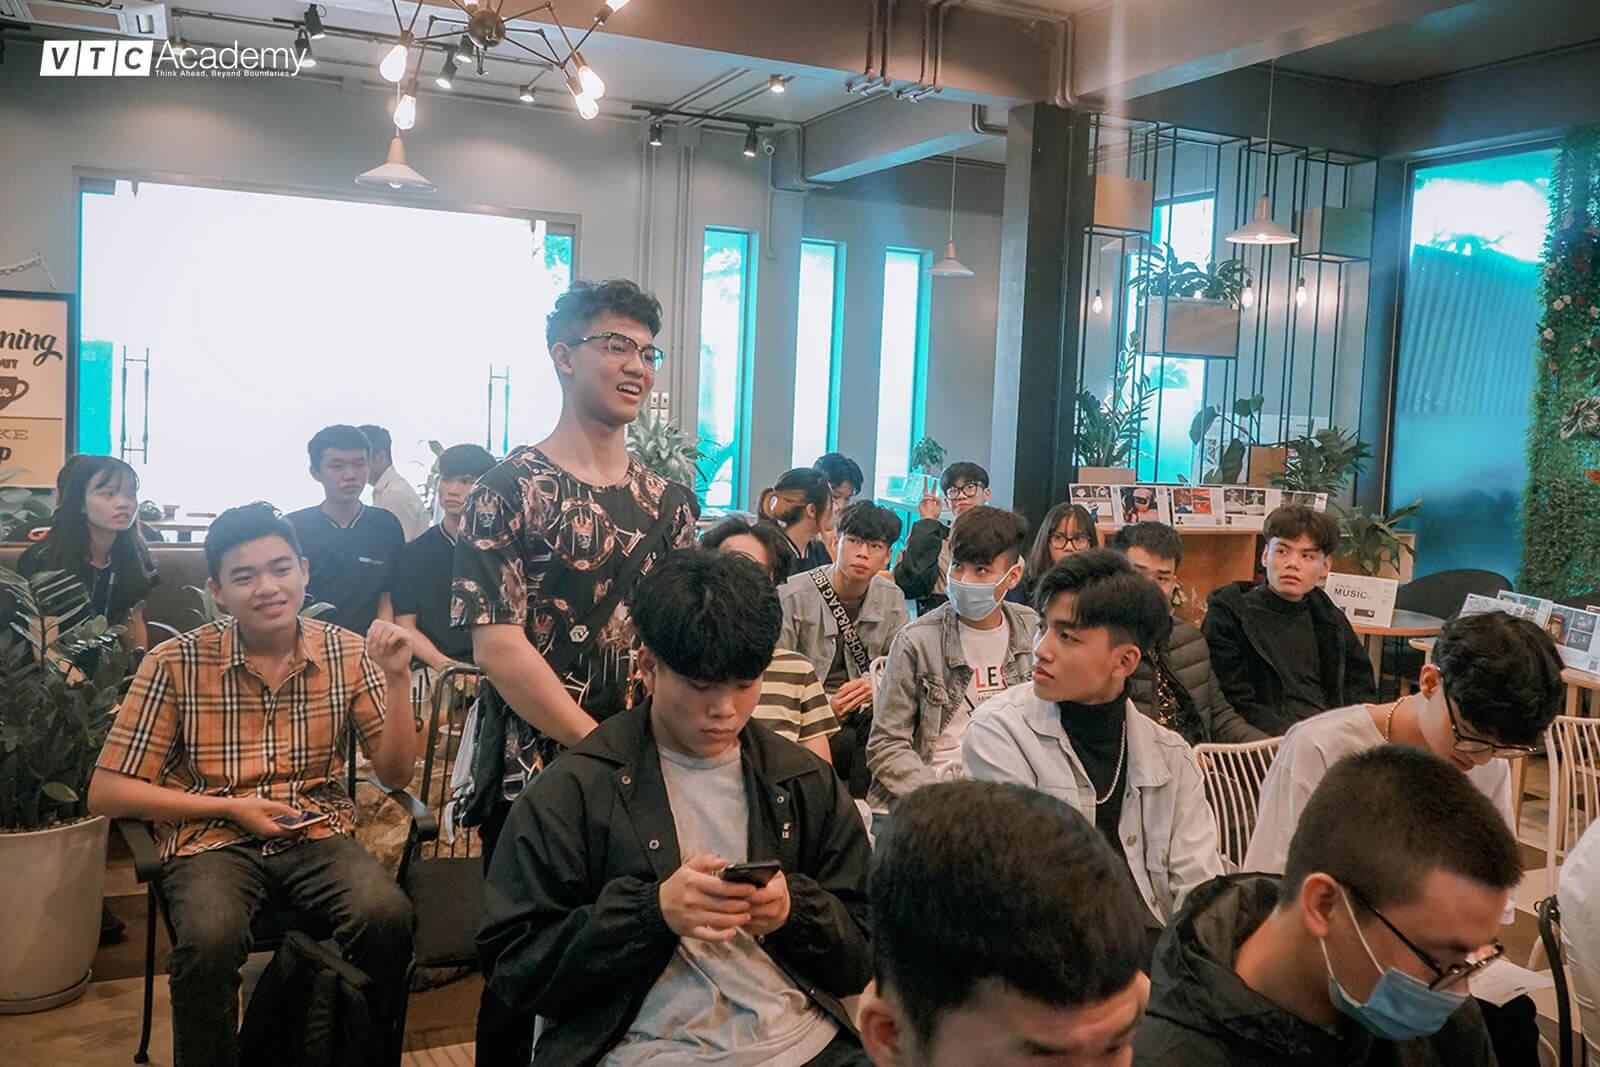 coffee-talk-phu-tho-vtc-academy-9